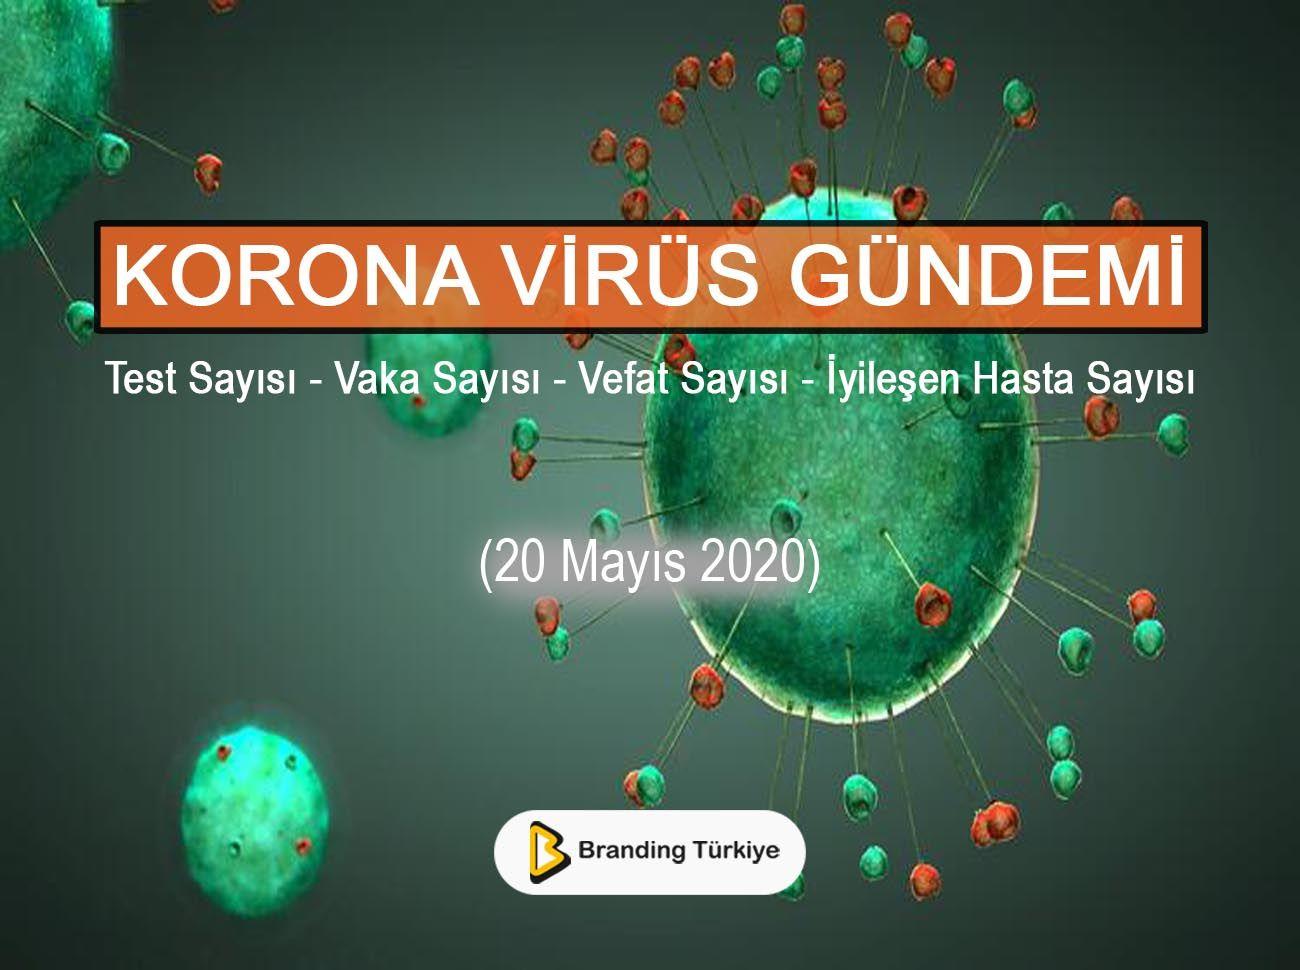 Korona Virüs Gündemi (20 Mayıs 2020)